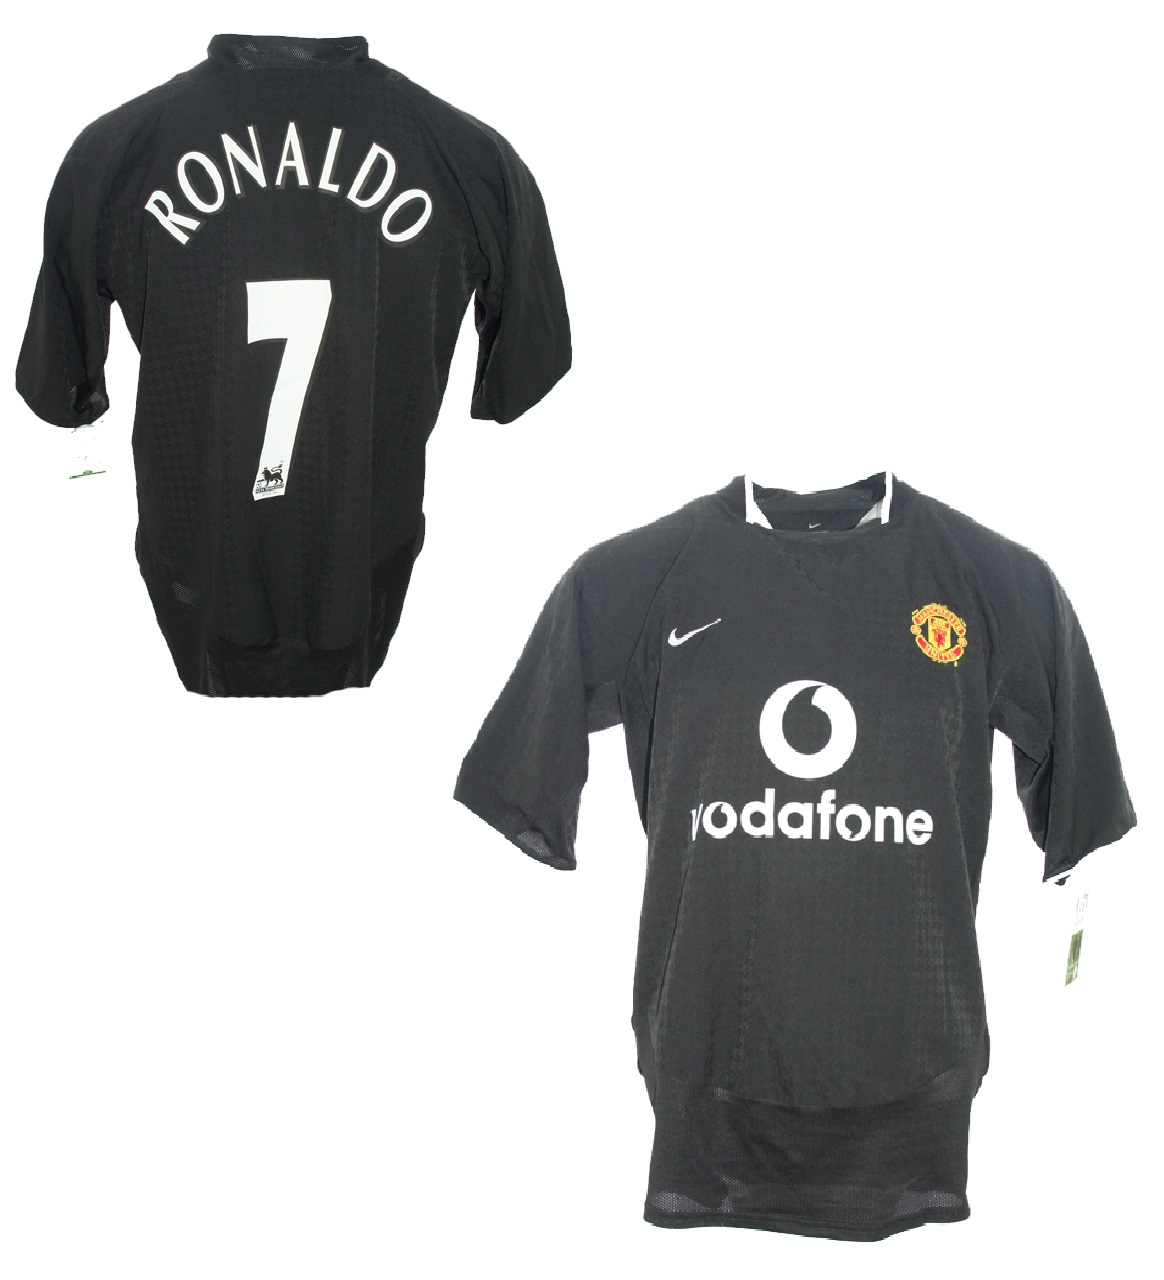 save off 91c67 bbf5f Nike Manchester United jersey 7 Cristiano Ronaldo 2003/04 ...